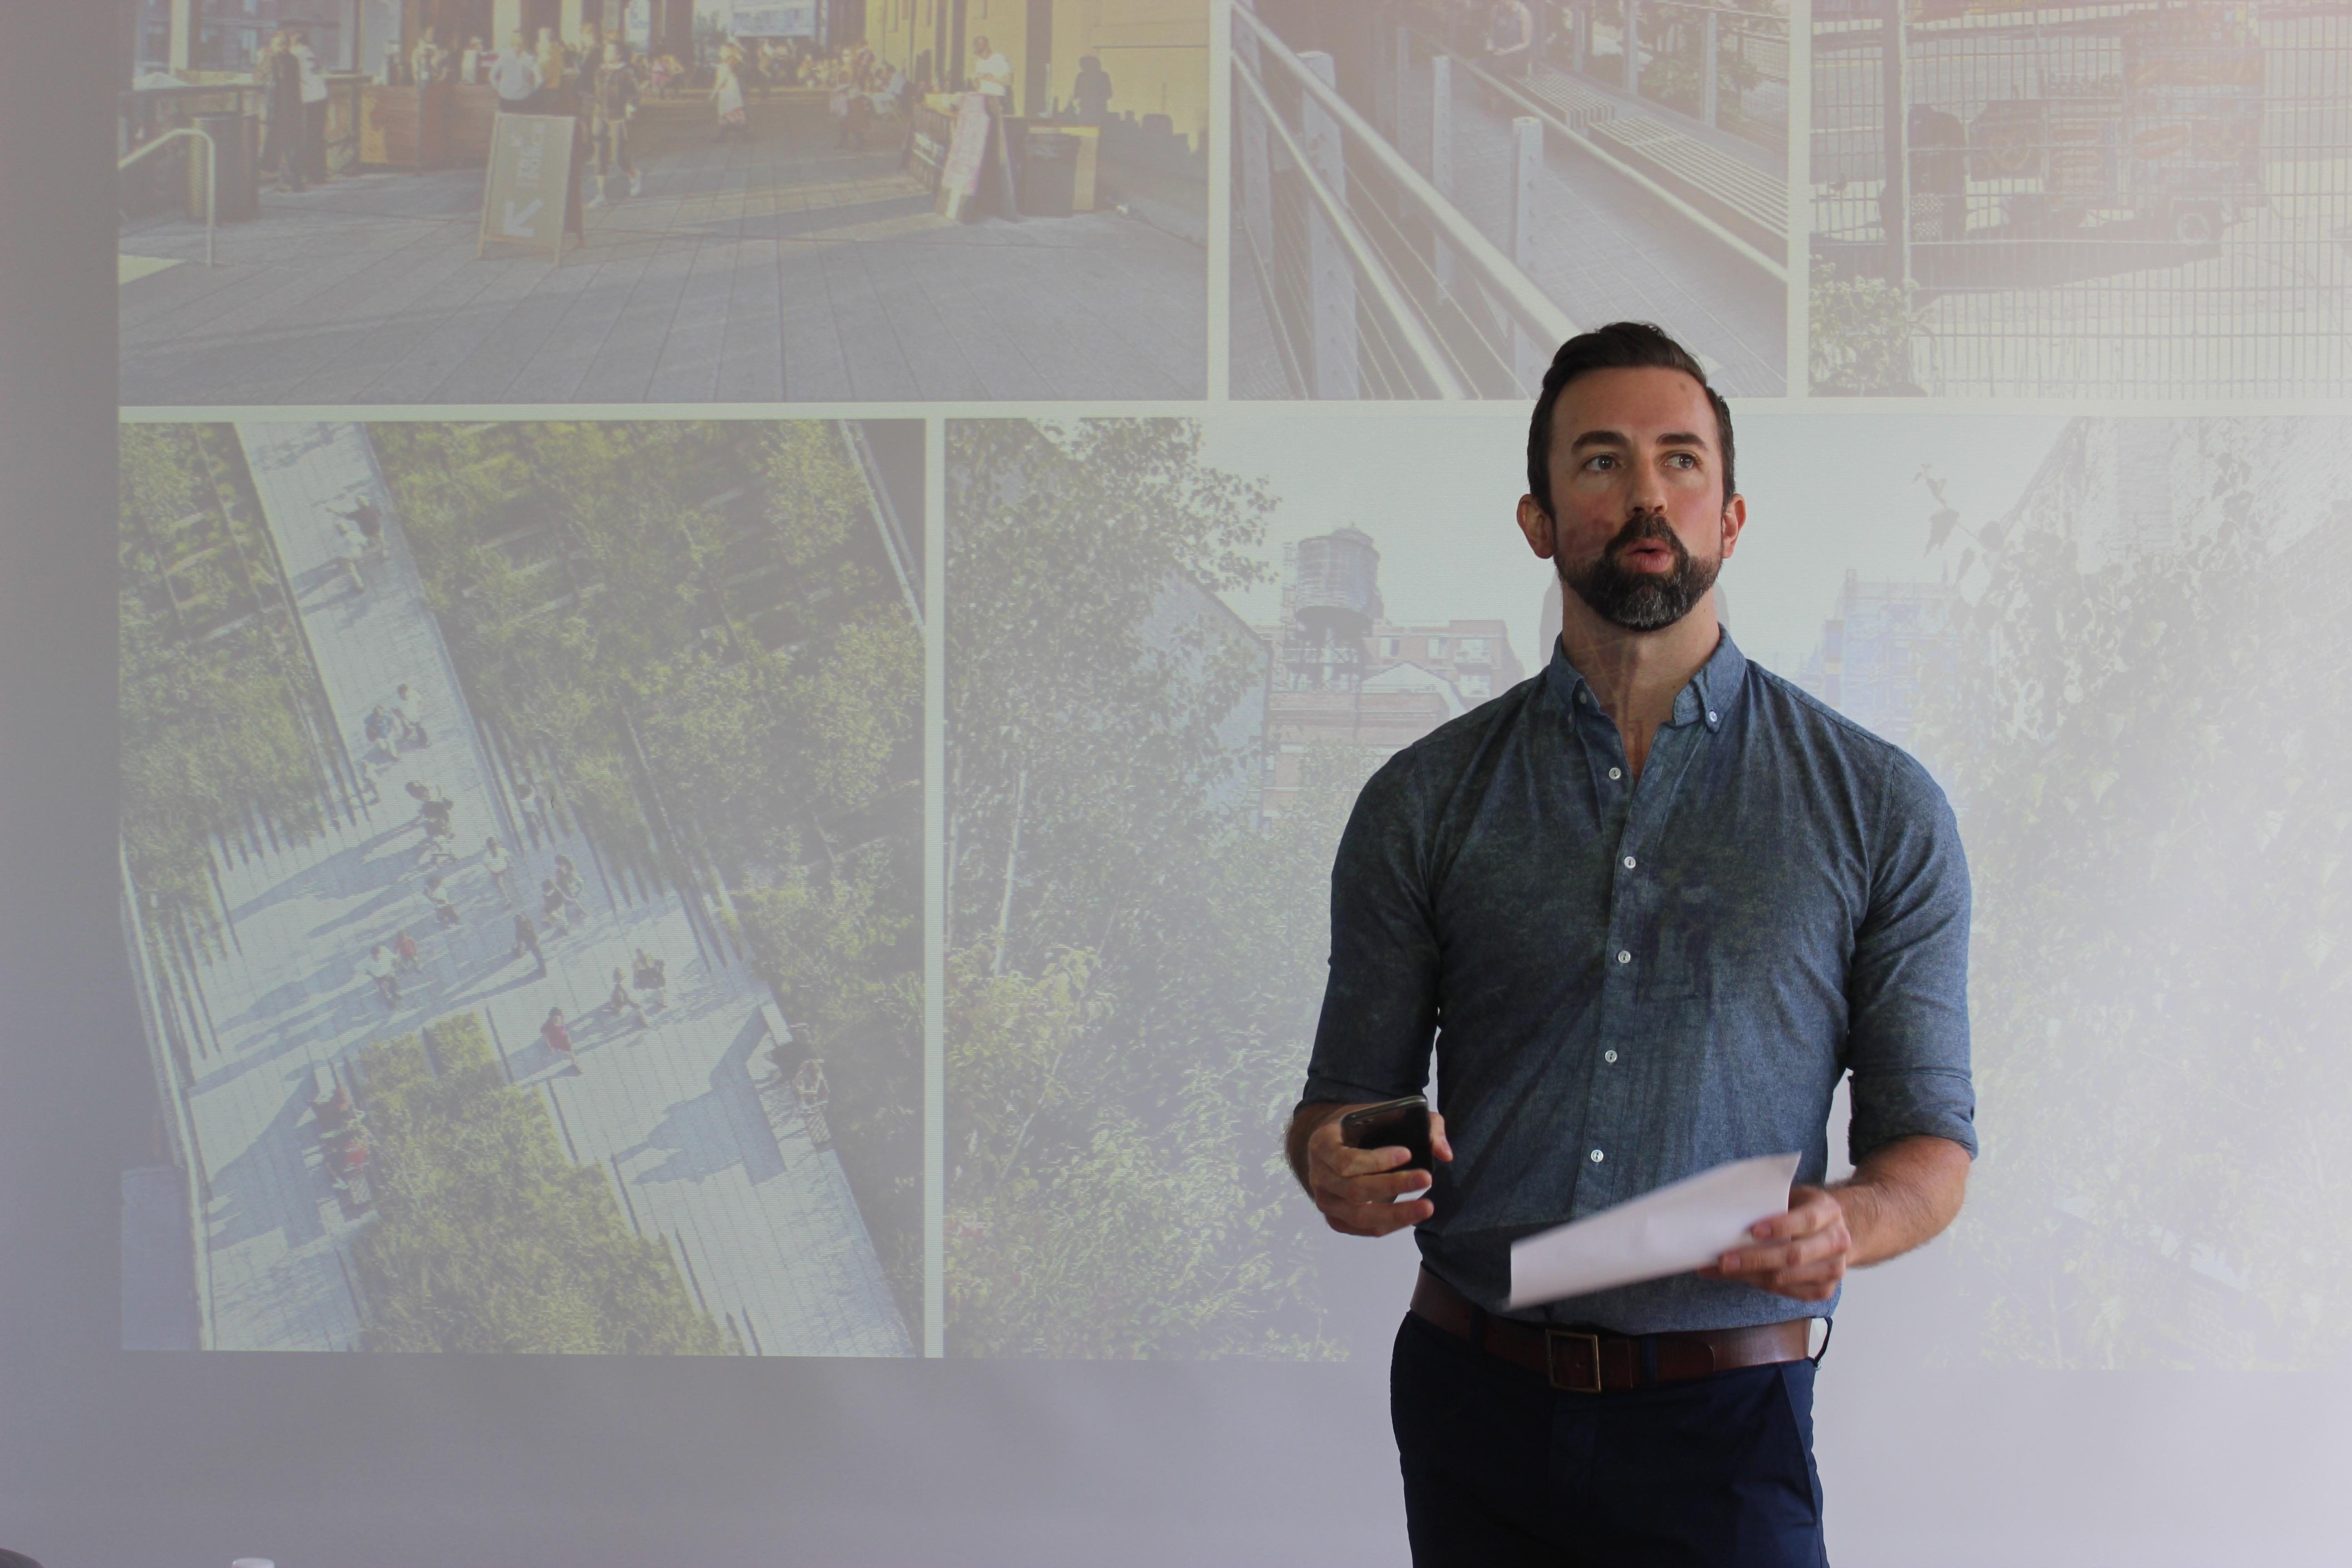 Ben Kerrick of KK&P introduces the charrette activity